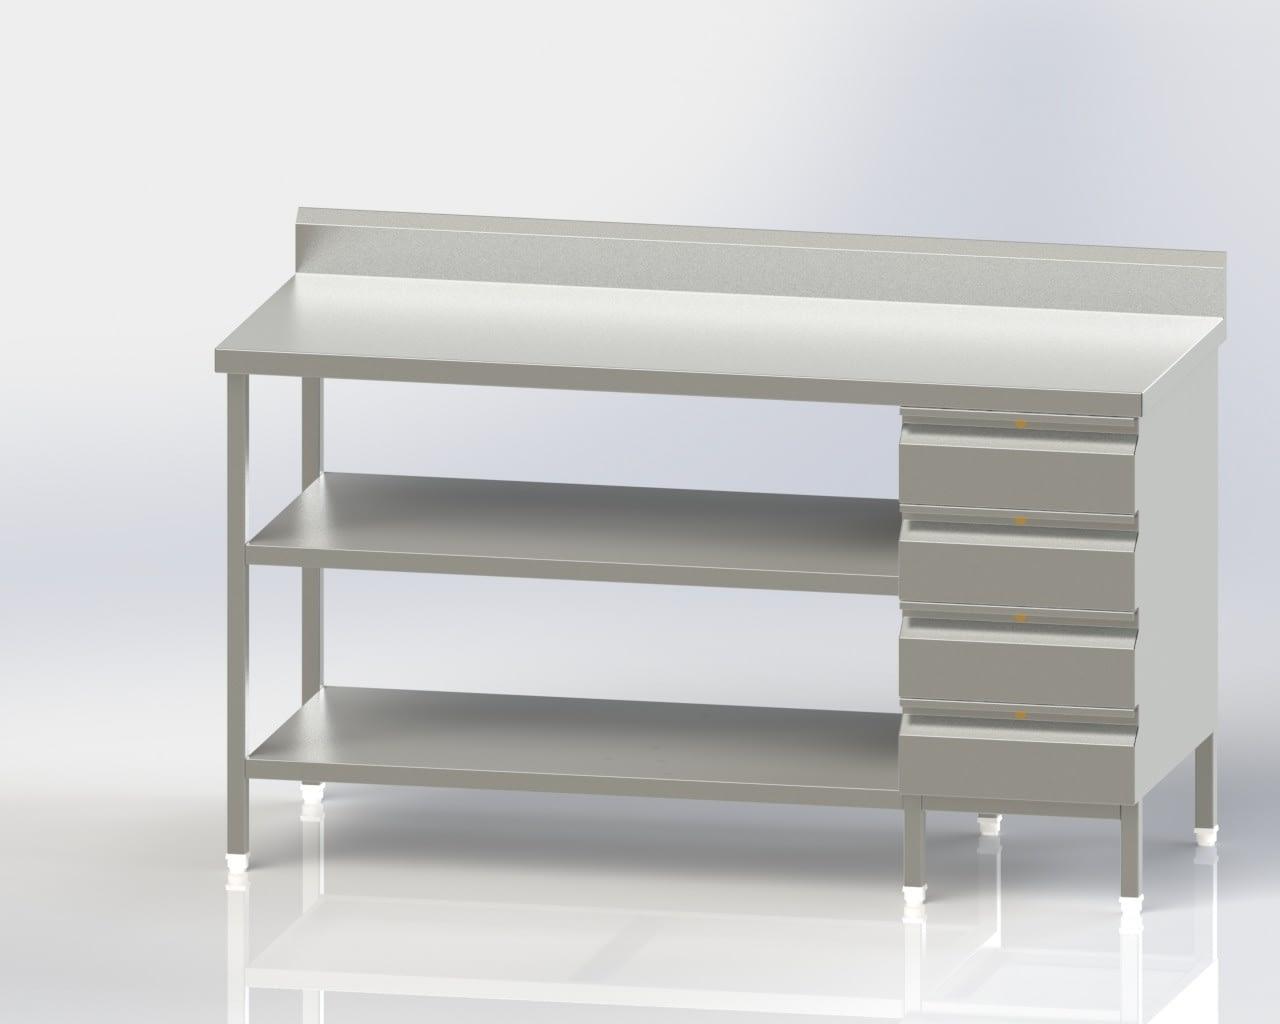 Work Table/4 Drawer/Lower and Intermeadiate Shelf